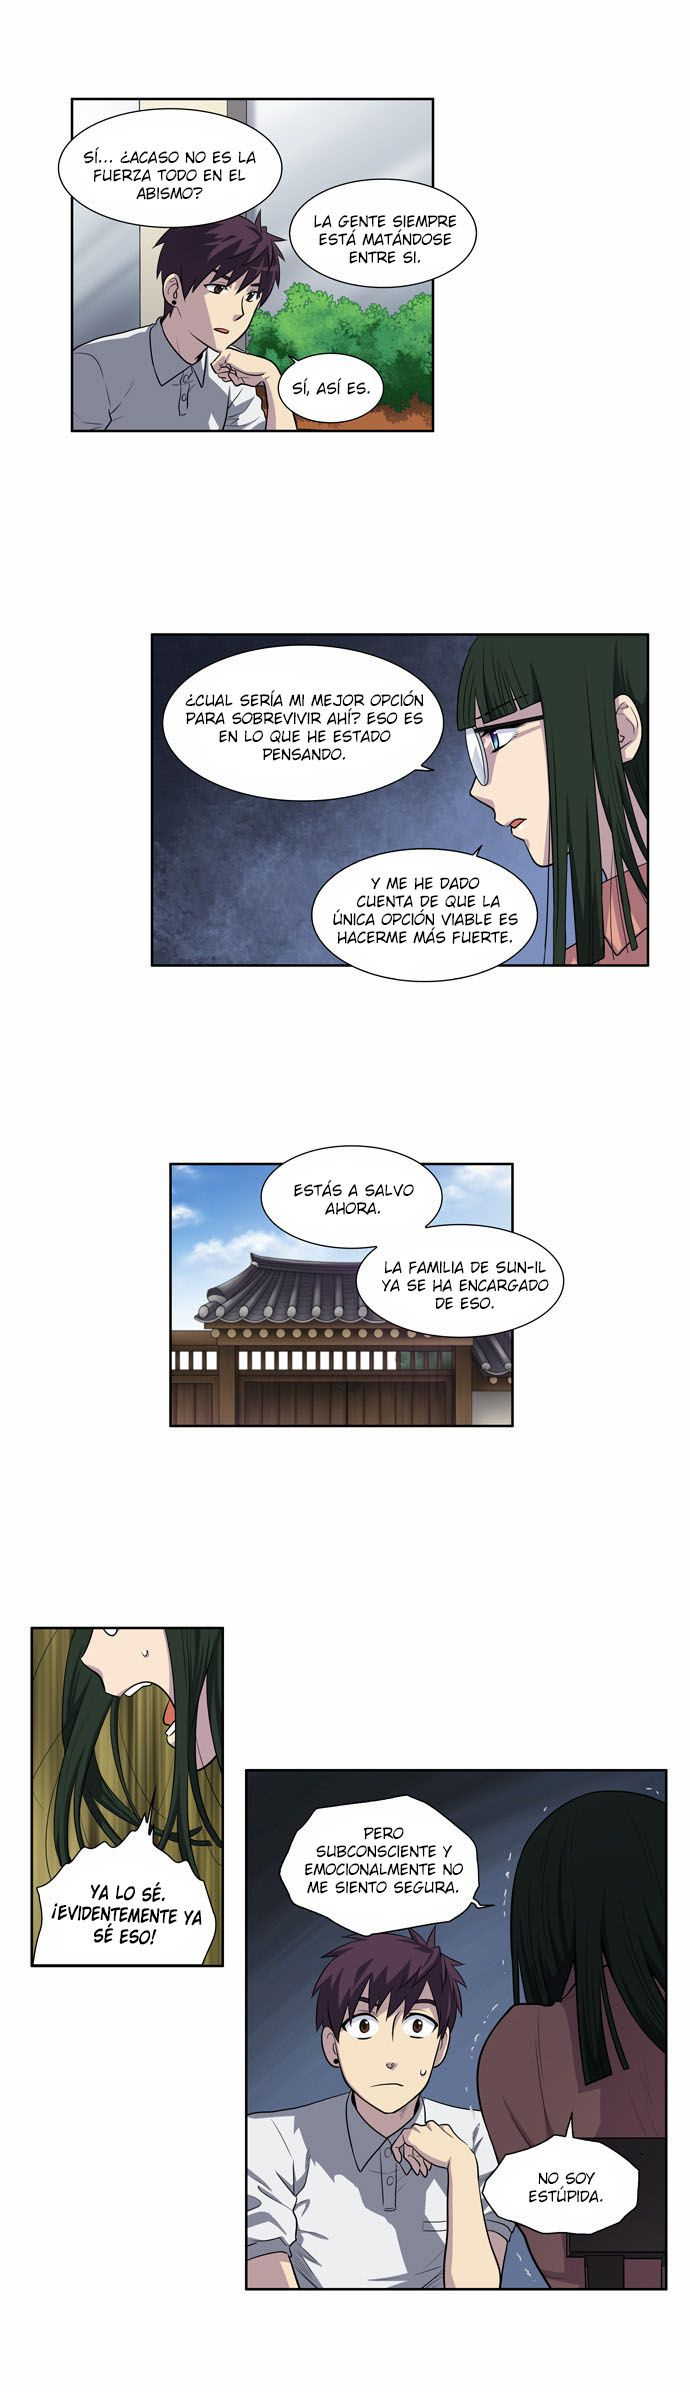 https://c5.ninemanga.com/es_manga/61/1725/474226/a1784c255fc4d3d42f3eeb1c39ce53bf.jpg Page 3